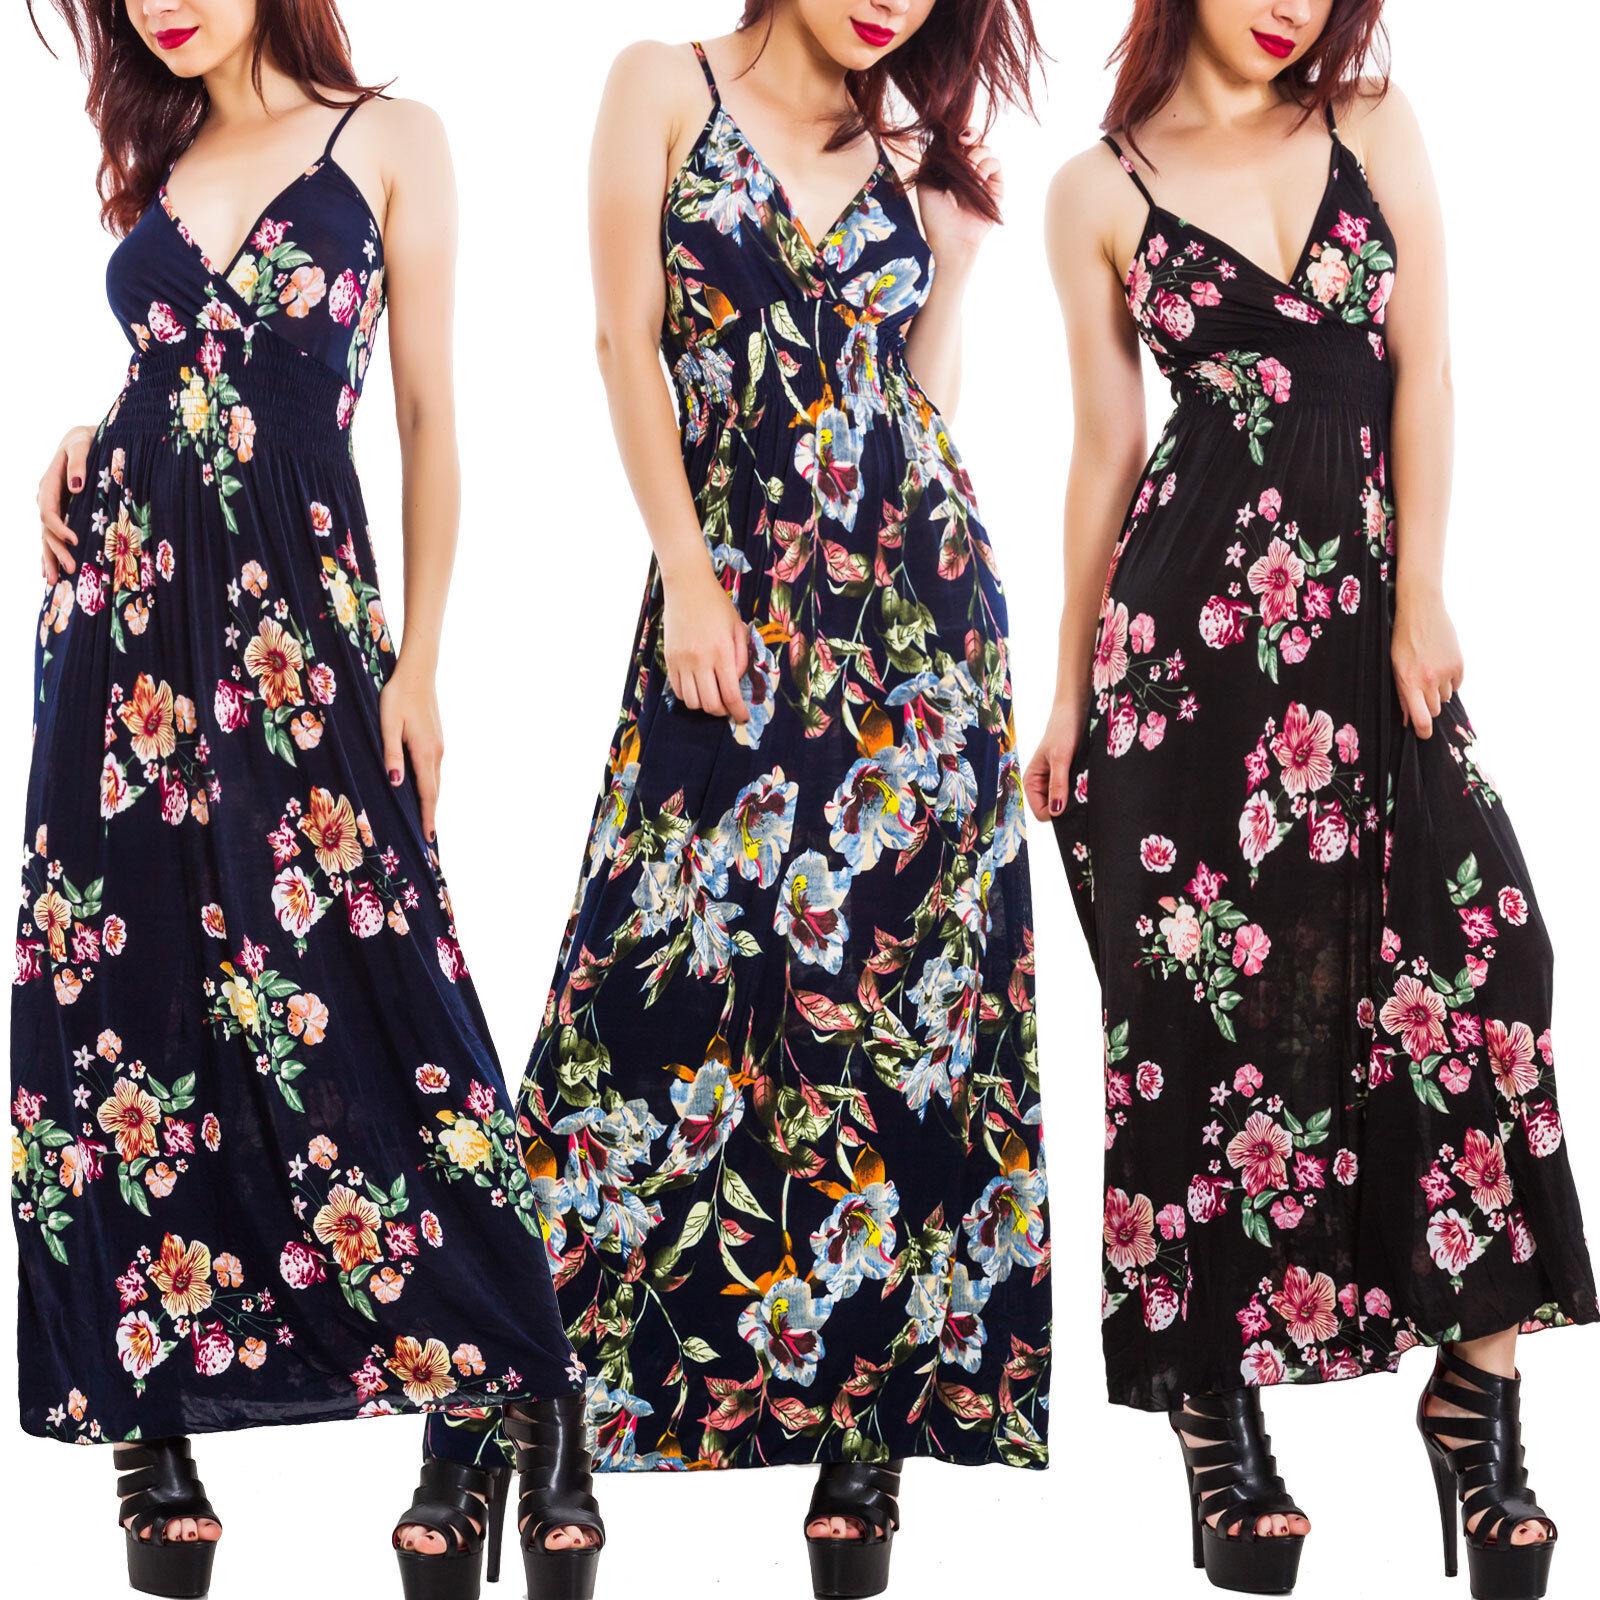 Robe femme longue robe maxi motif V à fleurs cou en V motif floral élégant  sexy 03e94bf050a